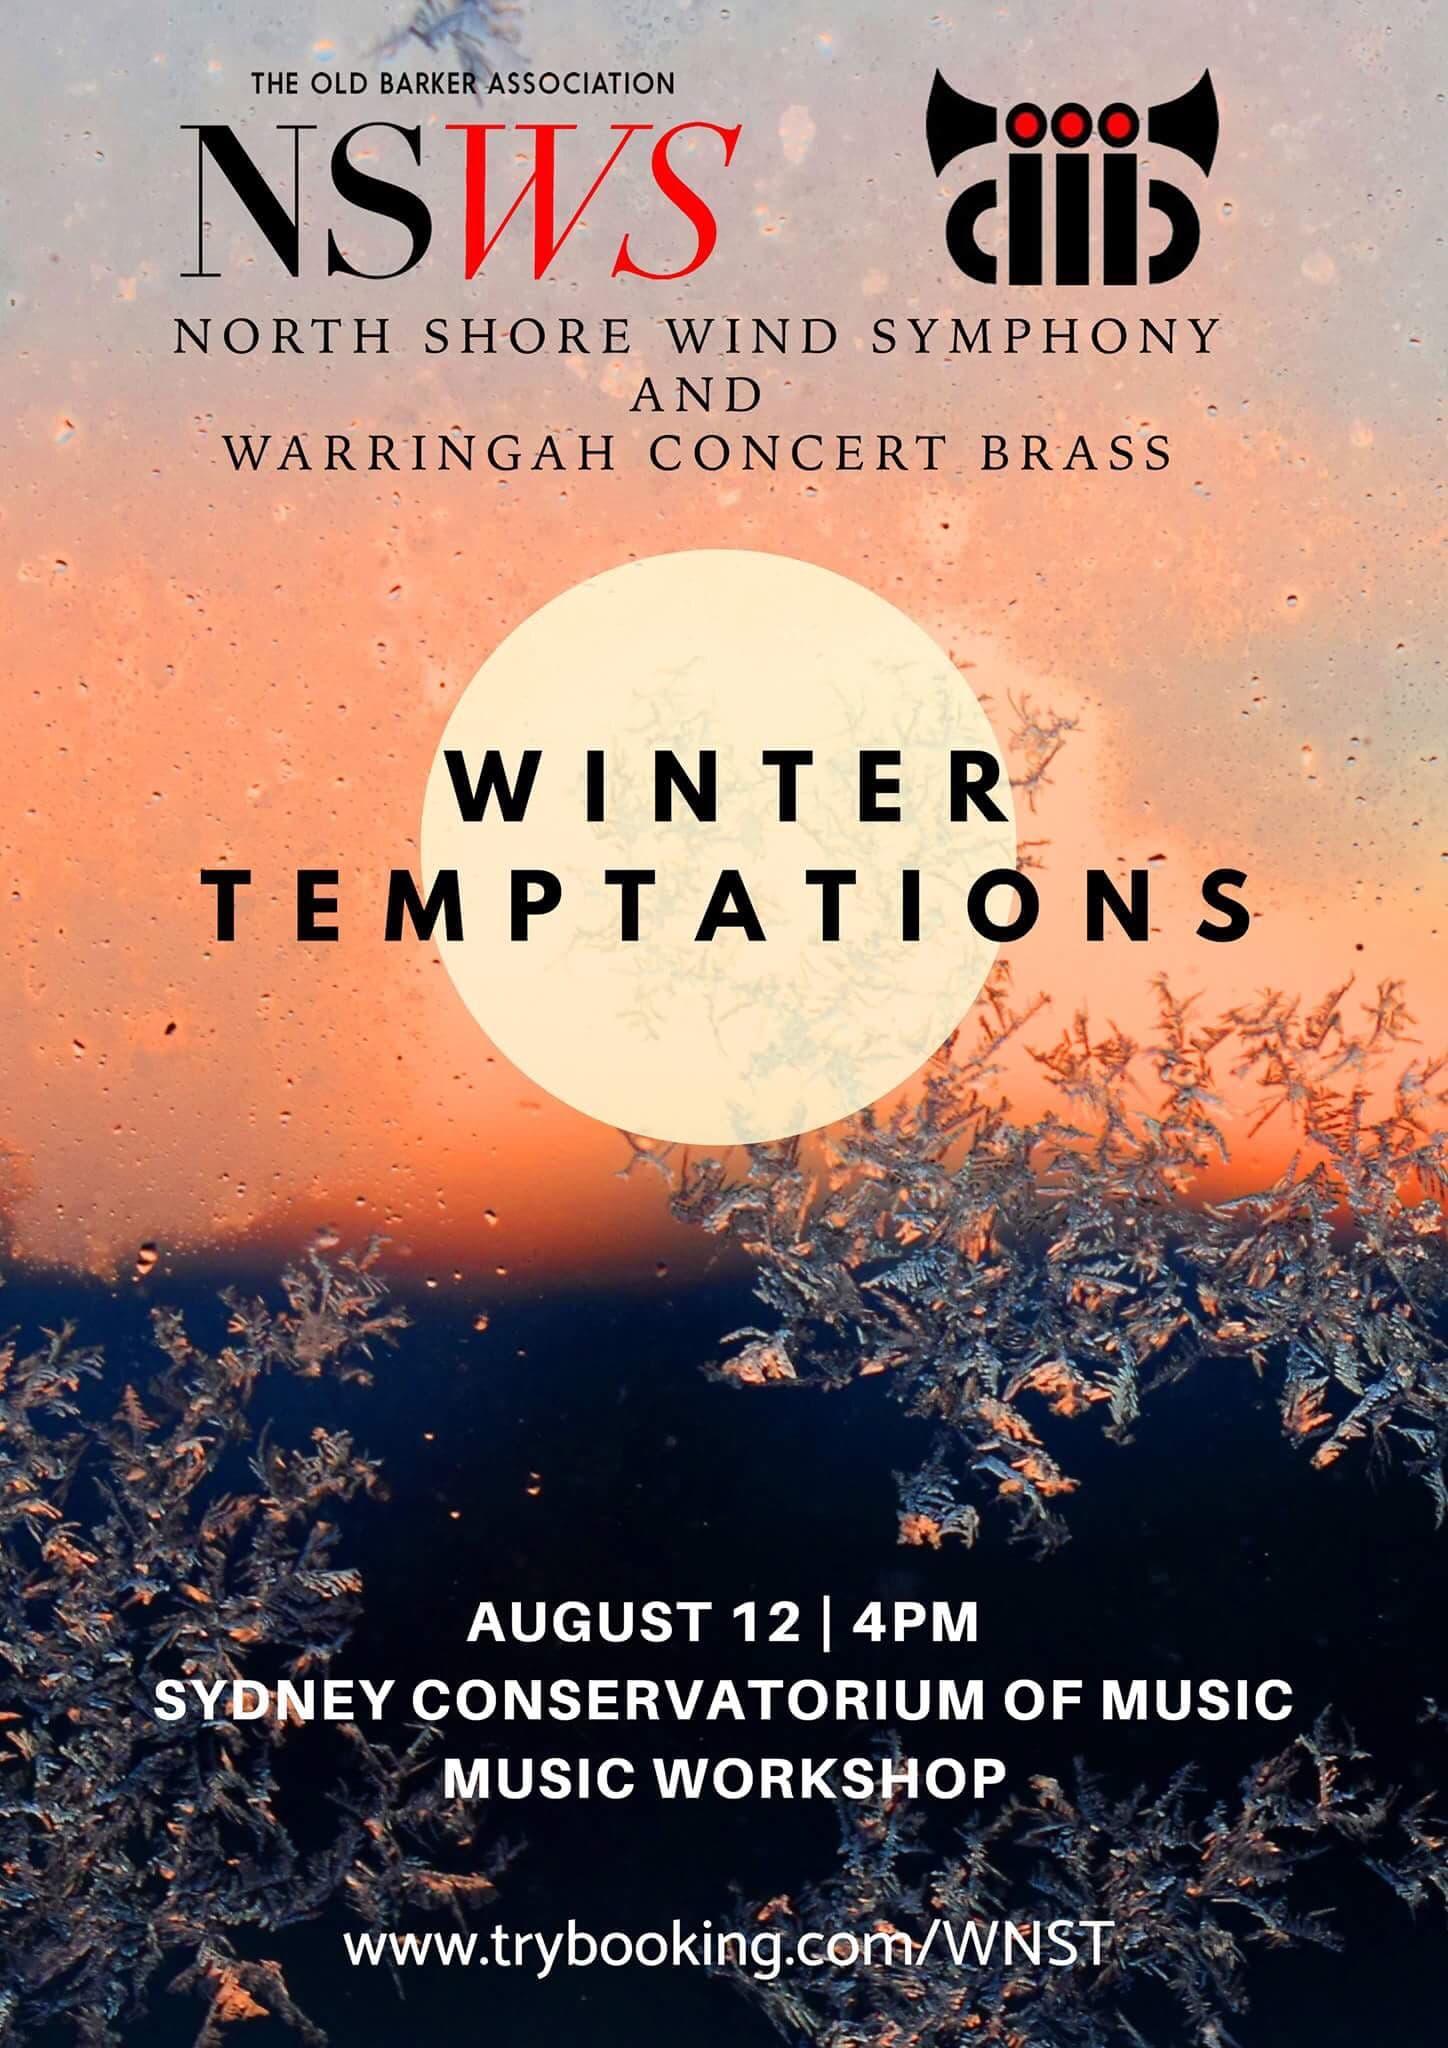 winter temptations - SUNDAY AUGUST 12 2018ARMENIAN DANCES (PART 1)Alfred ReedSHELTERING SKYJohn MackeyMOTHViet CuongSPOON RIVERPercy GraingerLOST VEGASMichael Daugherty